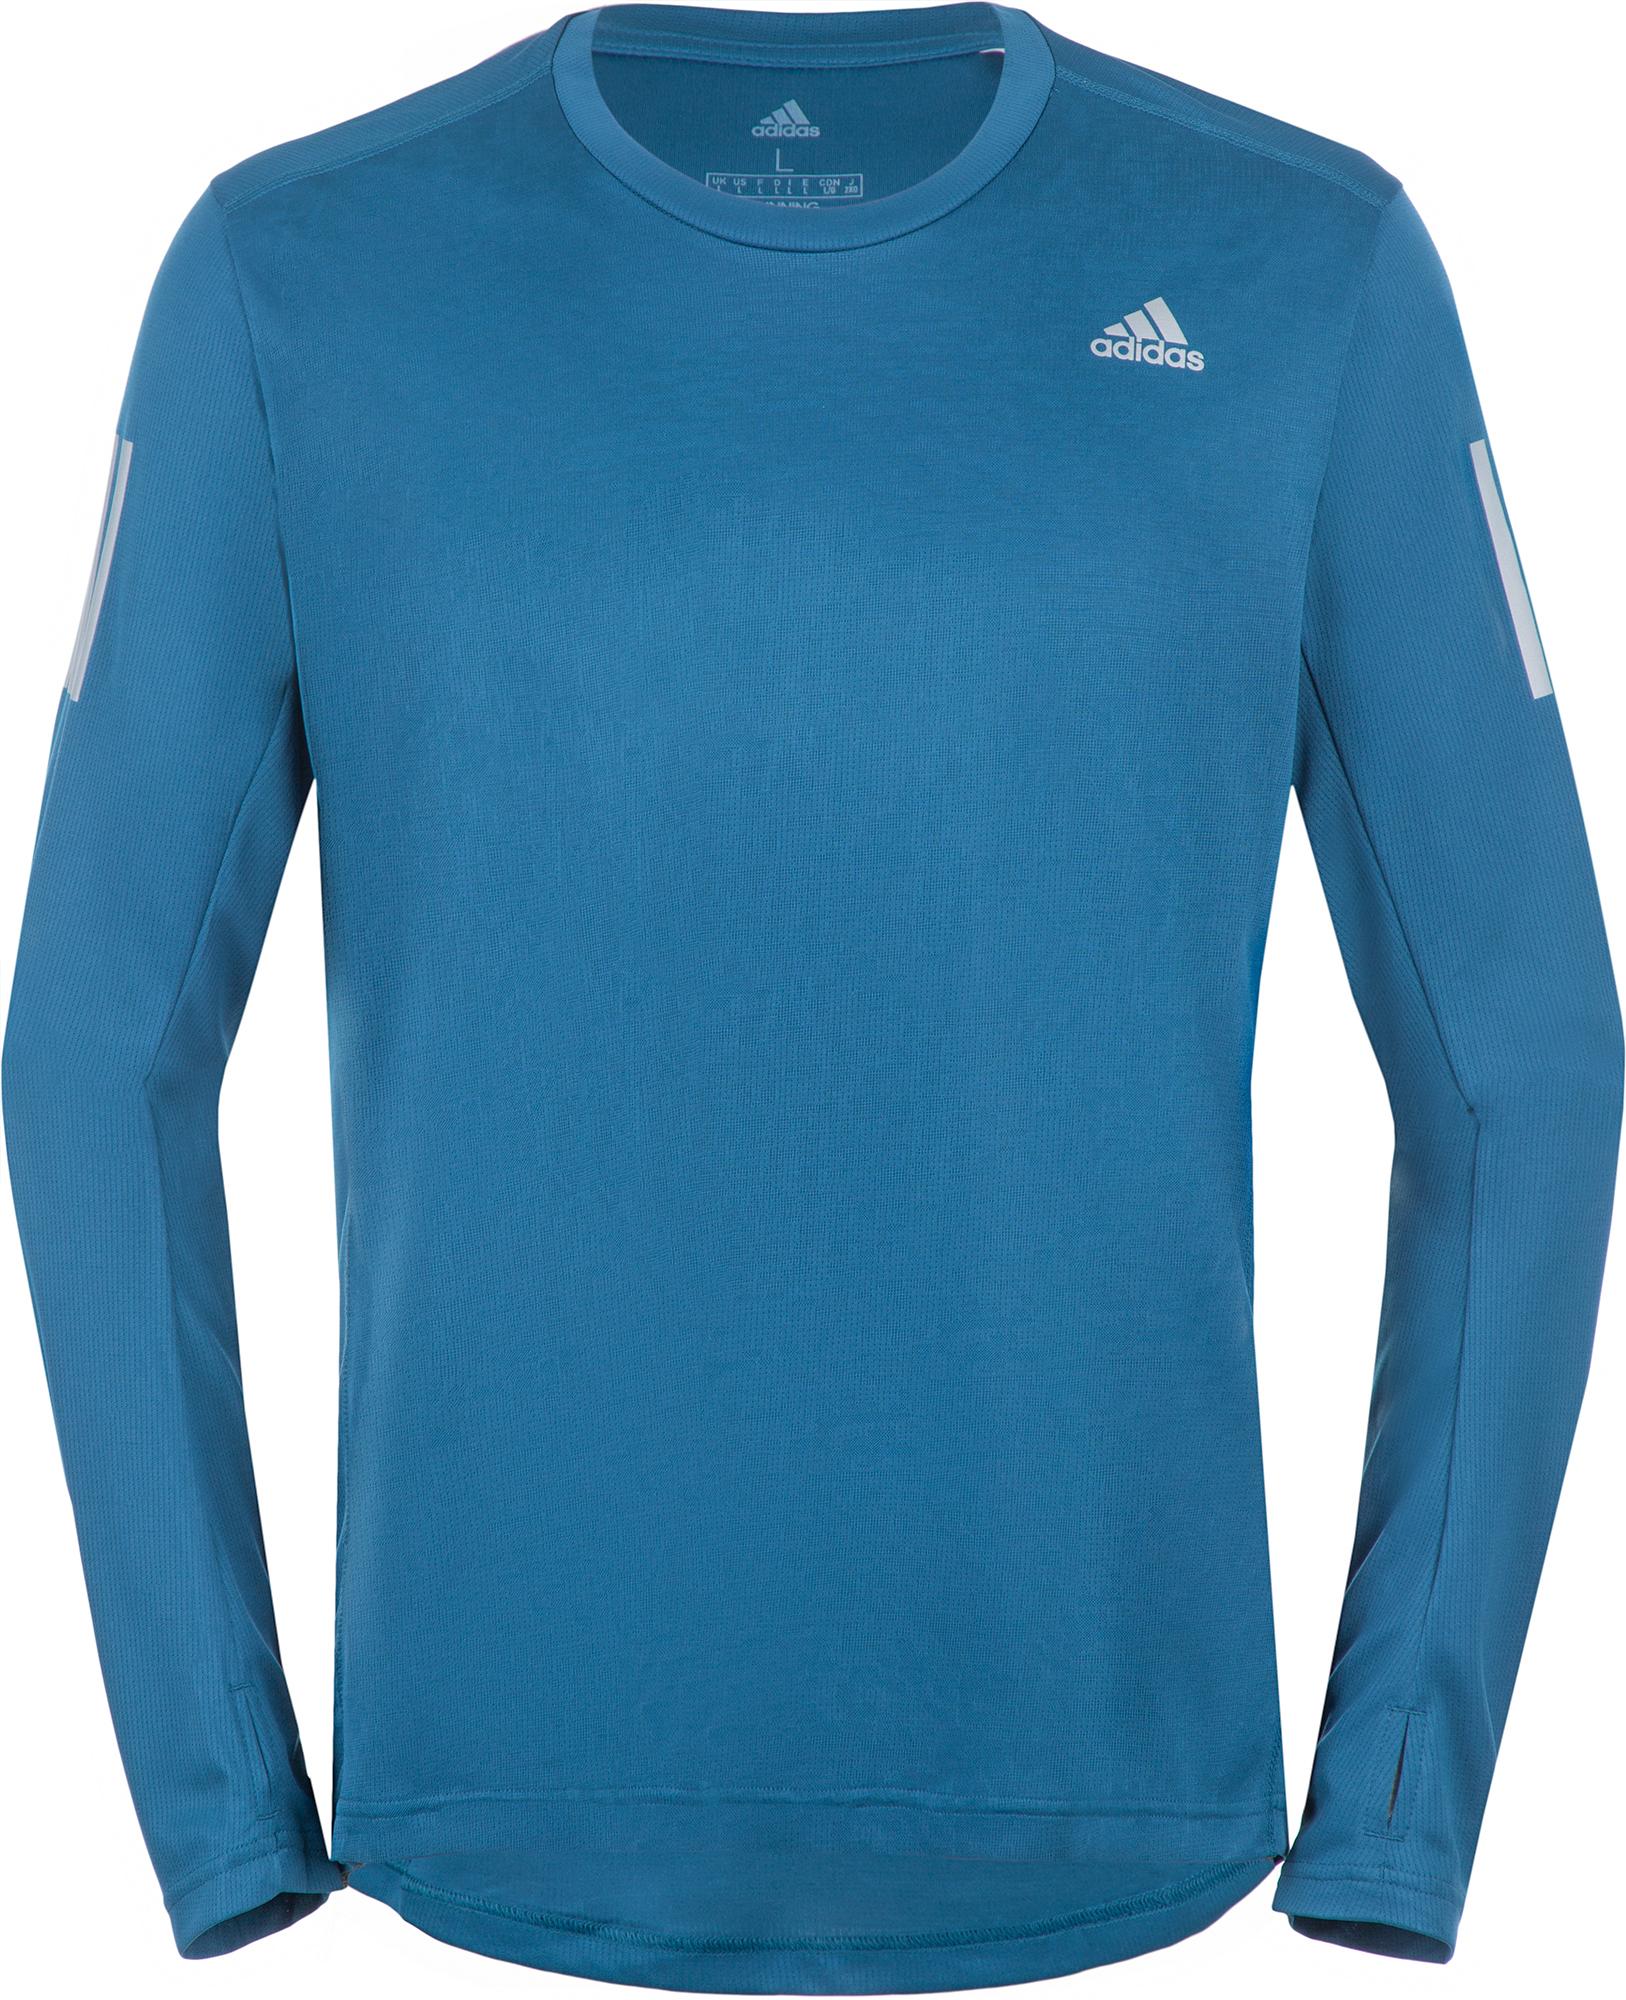 Adidas Лонгслив мужской Own The Run, размер 54